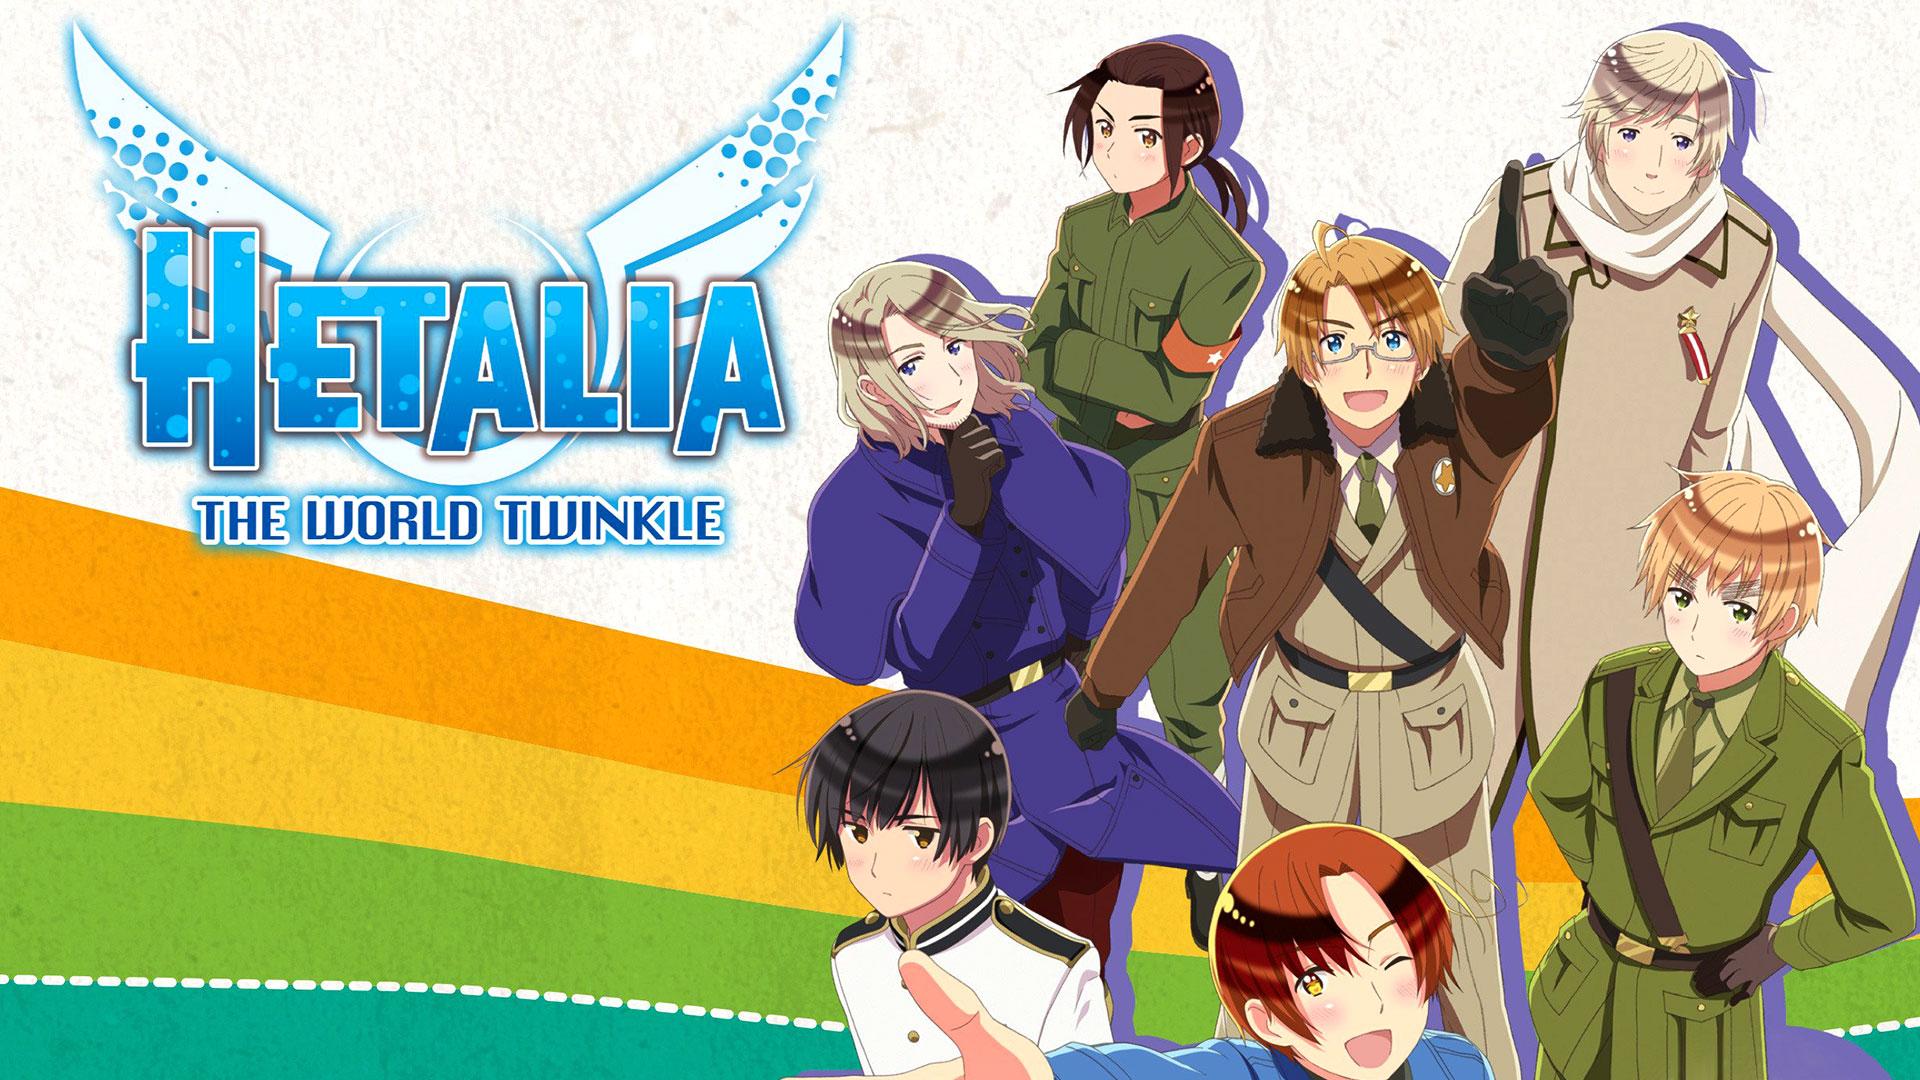 Hetalia: The World Twinkle, Season 6